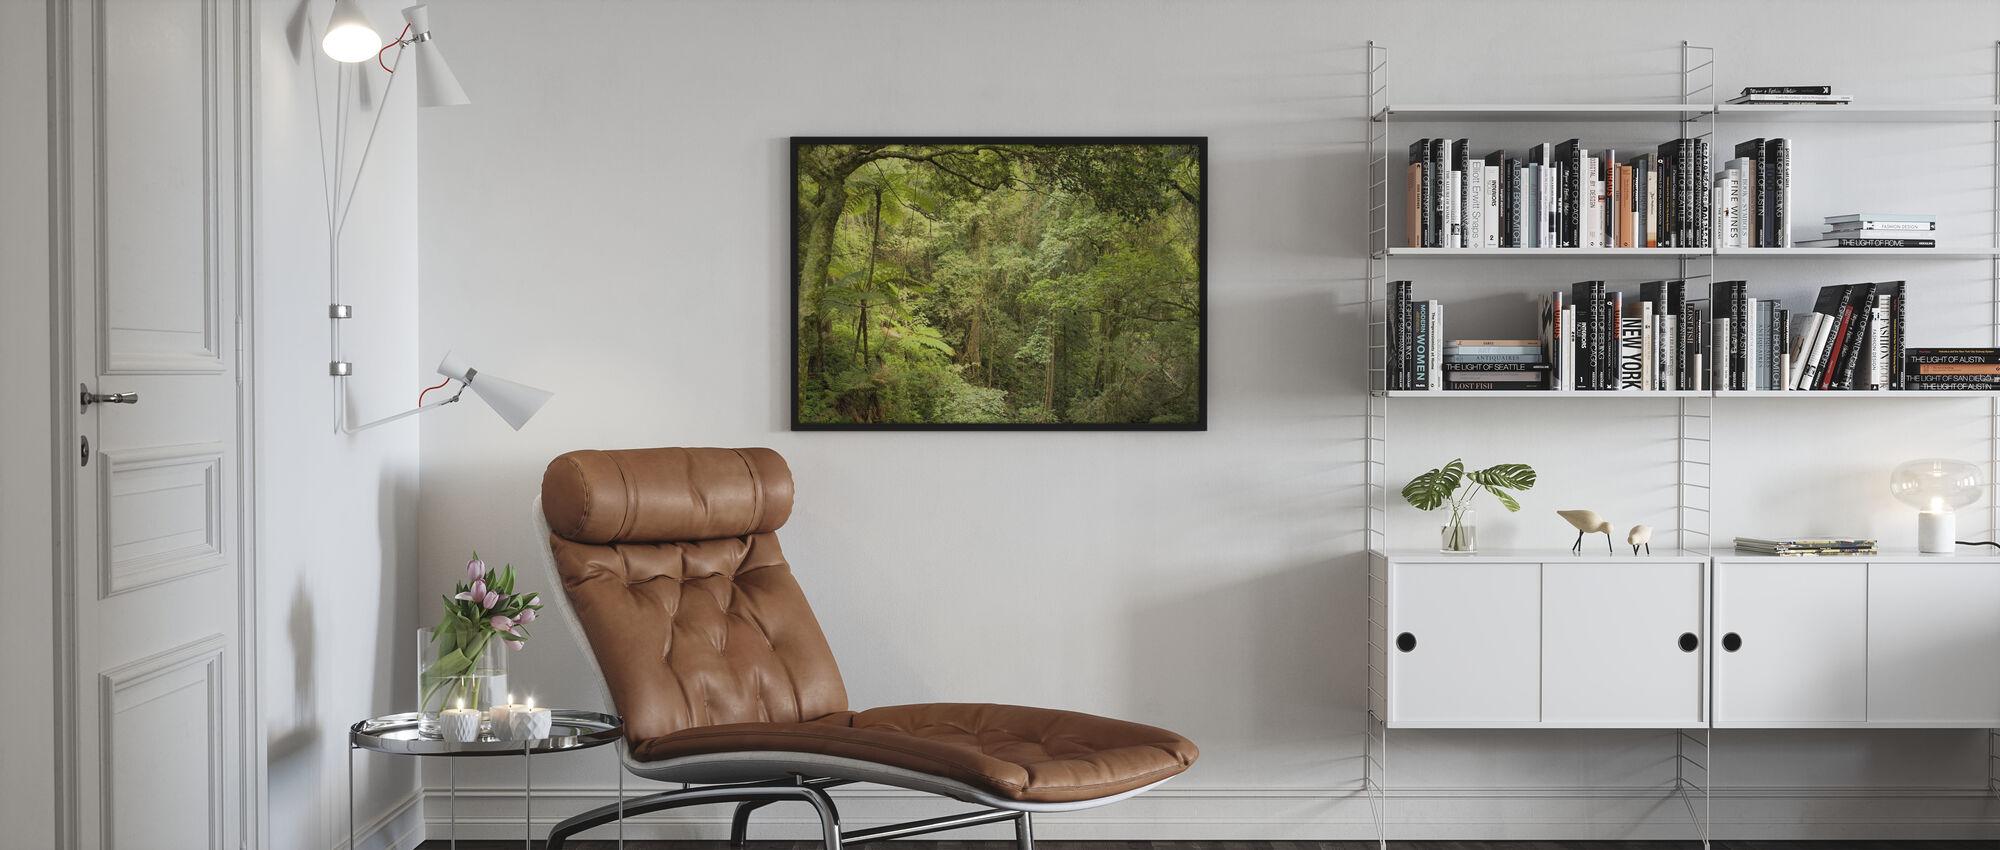 Bunya Mountains National Park - Poster - Living Room